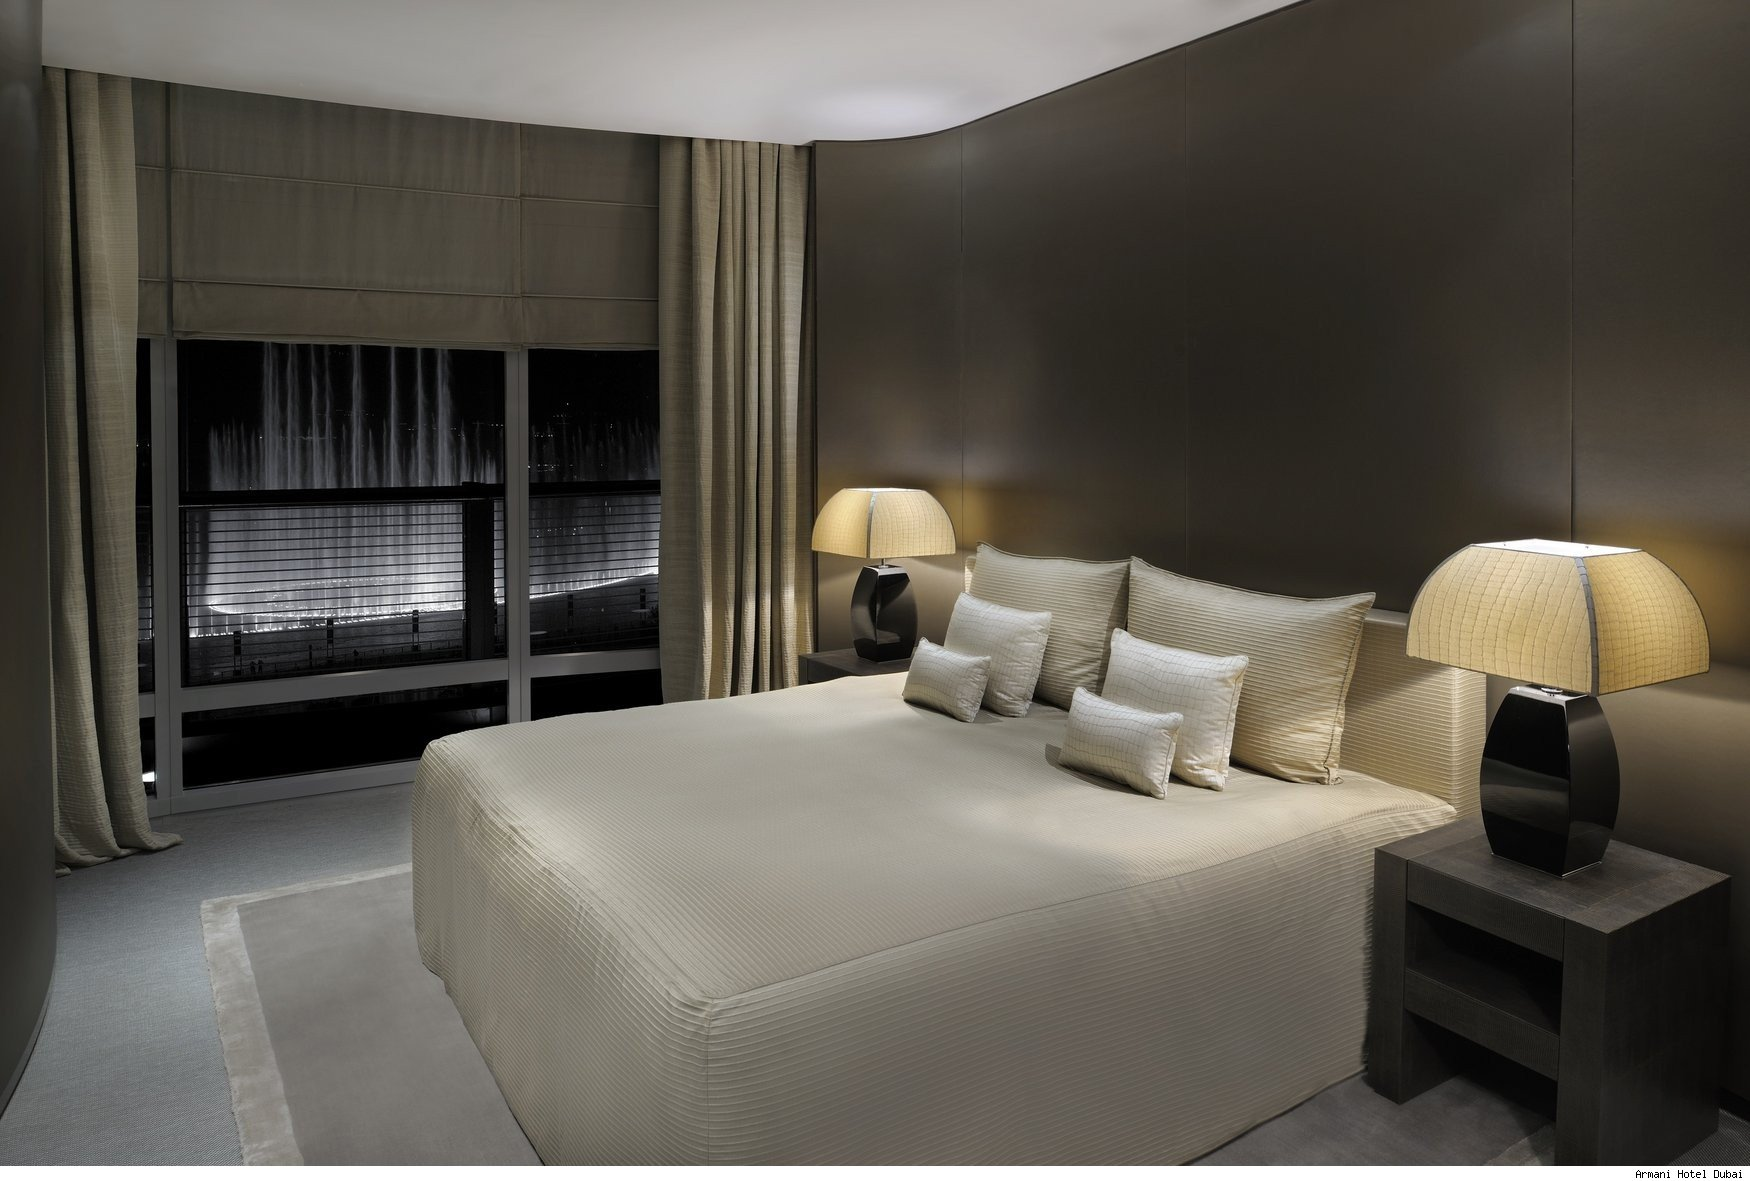 Dubai hotels boast strong jump in revenue burj khalifa for Burj khalifa room rates